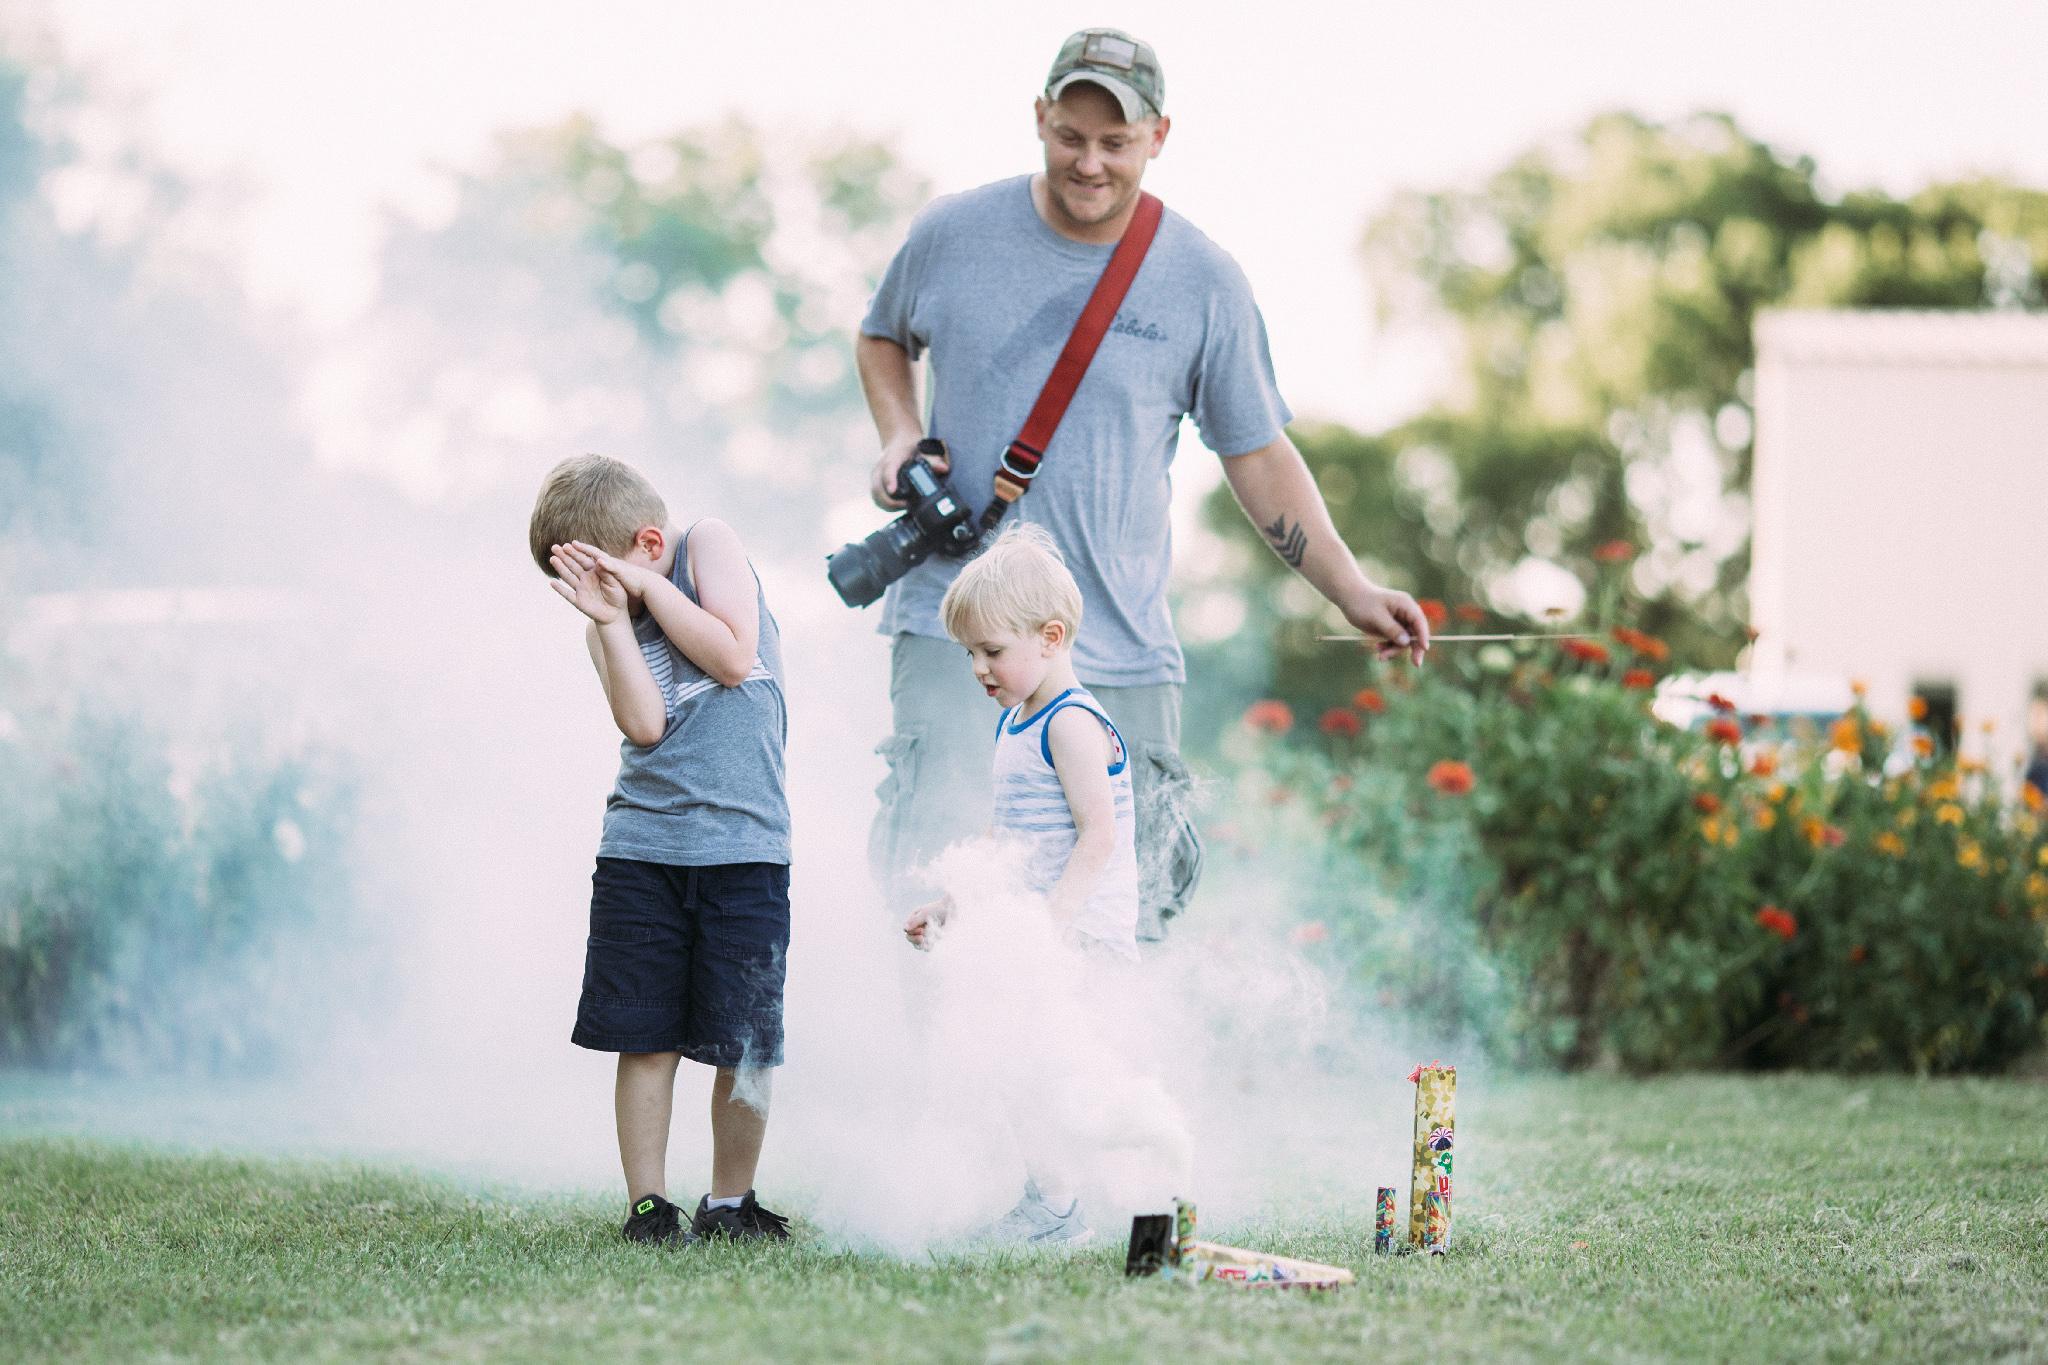 The boys loved running through the smoke.